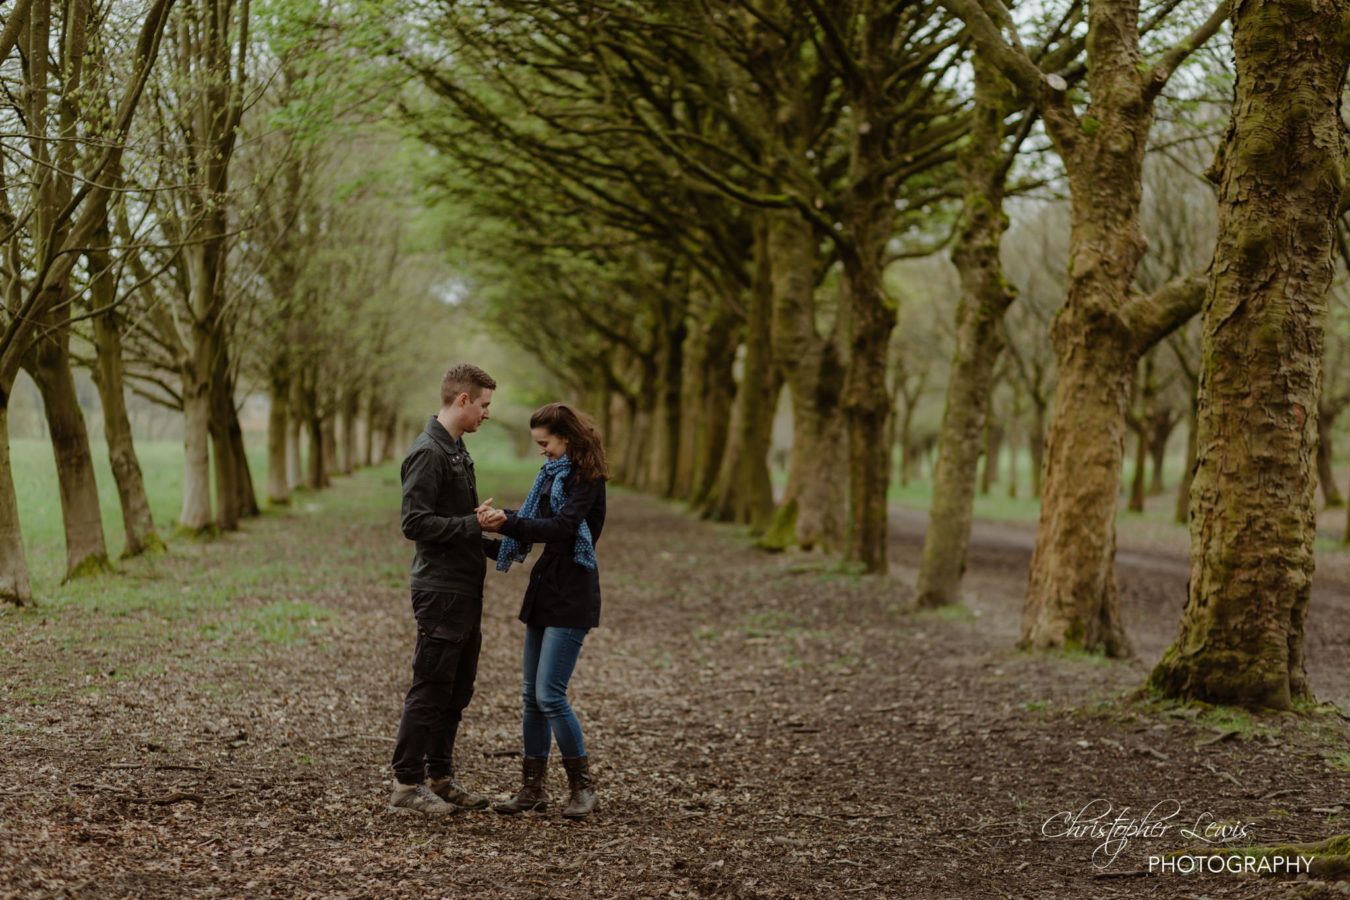 Colshaw-Hall-Pre-Wedding-Photo-17